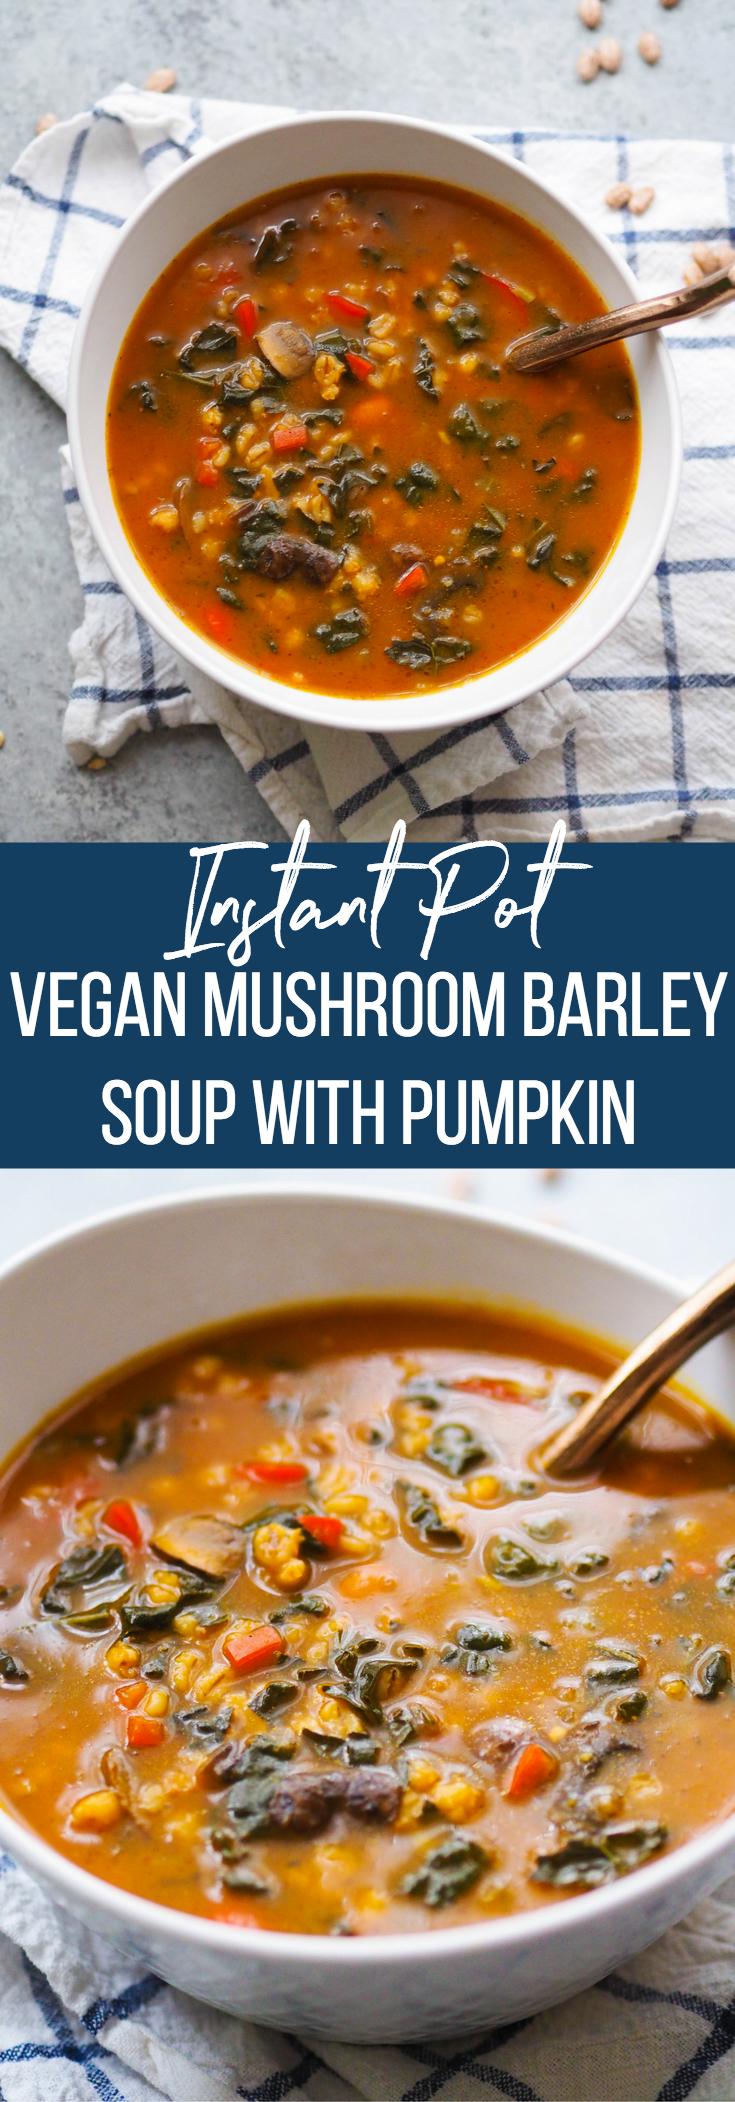 Instant-Pot-Vegan-Mushroom-Barley-Soup-With-Pumpkin.png